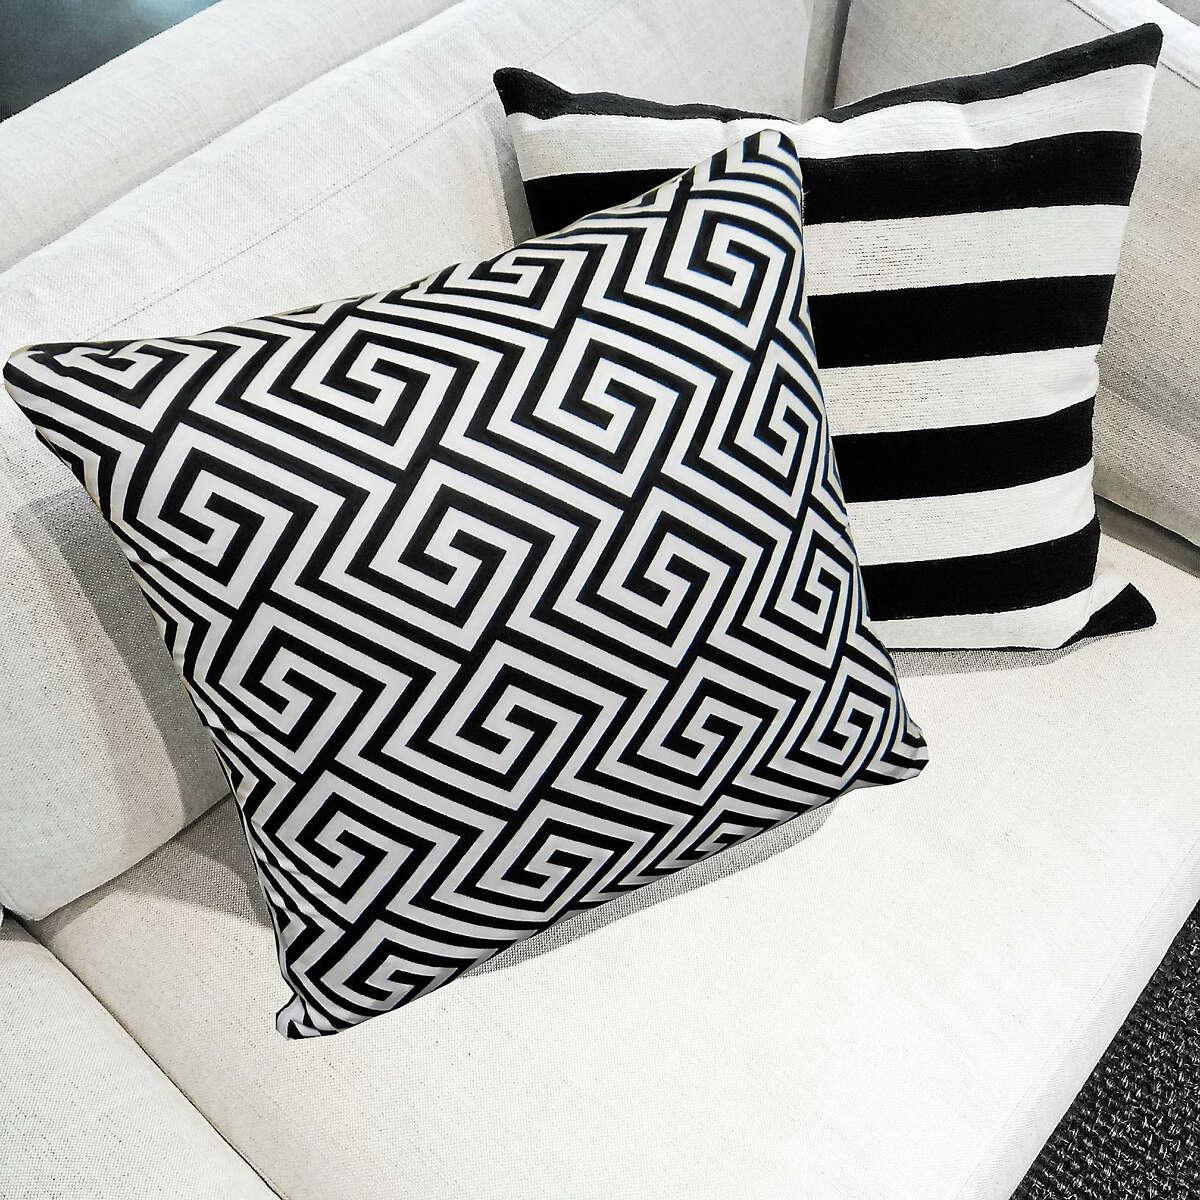 Black and white M Cushions on a sofa